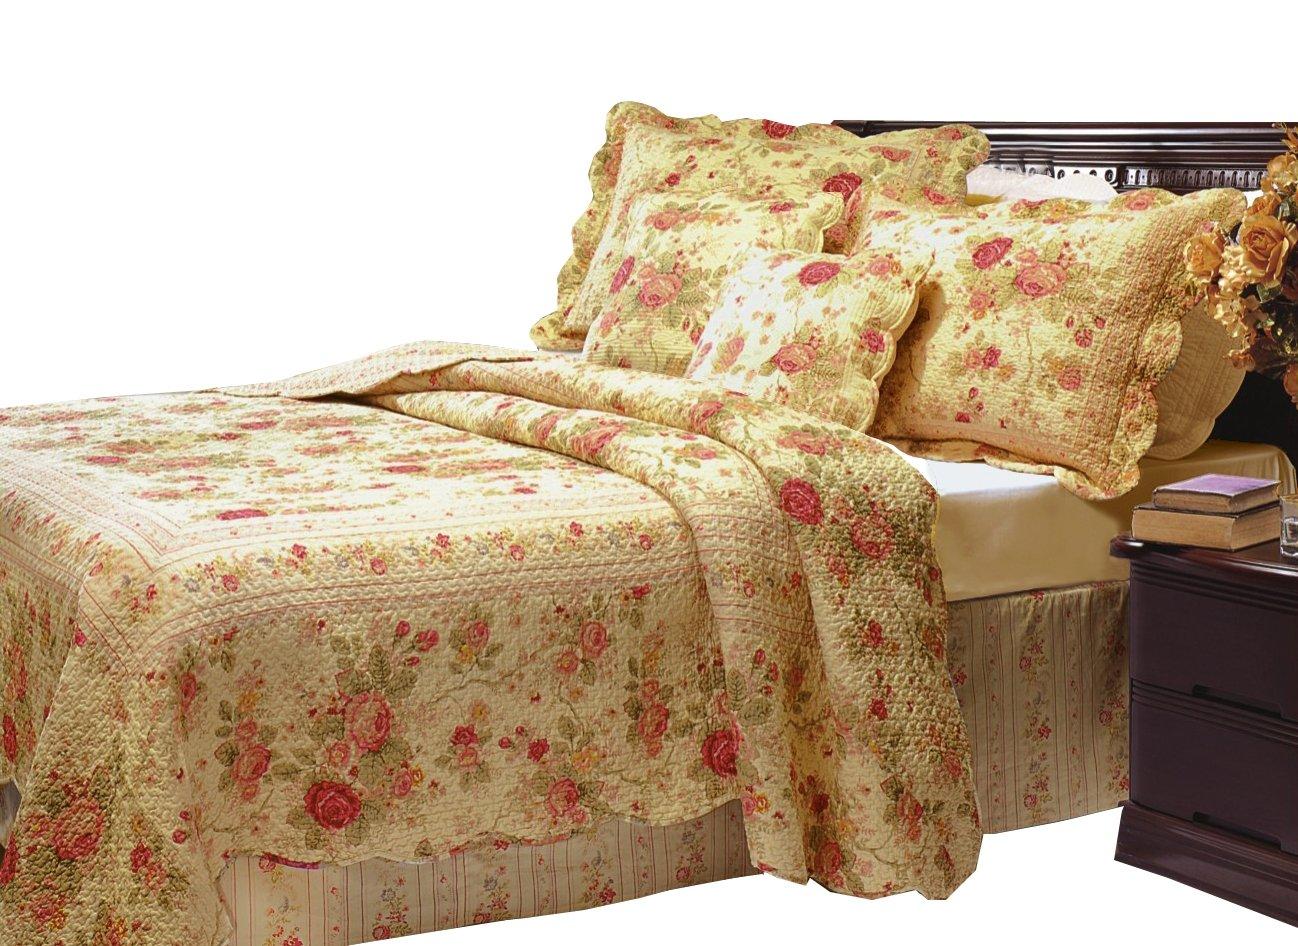 granny style bedding